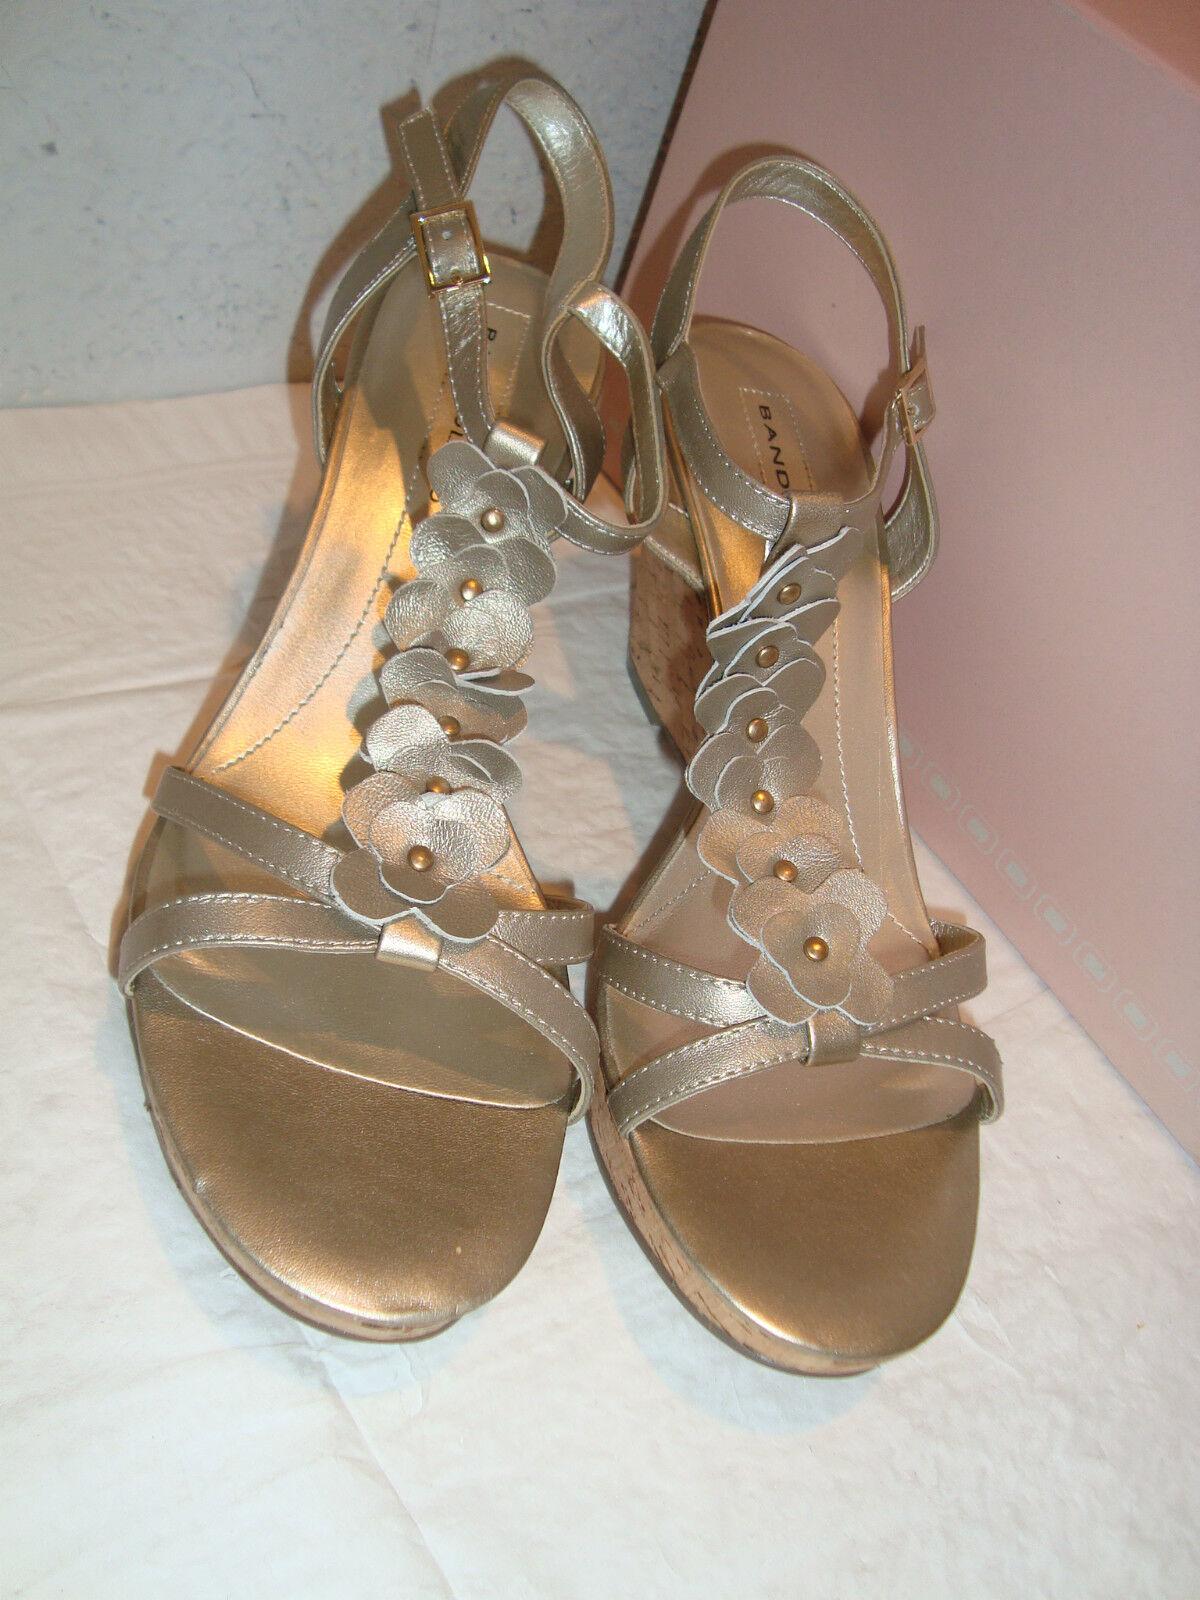 New Bandolino Damenschuhe Ninette Light Gold Wedge Sandaleen Schuhes 10 Medium